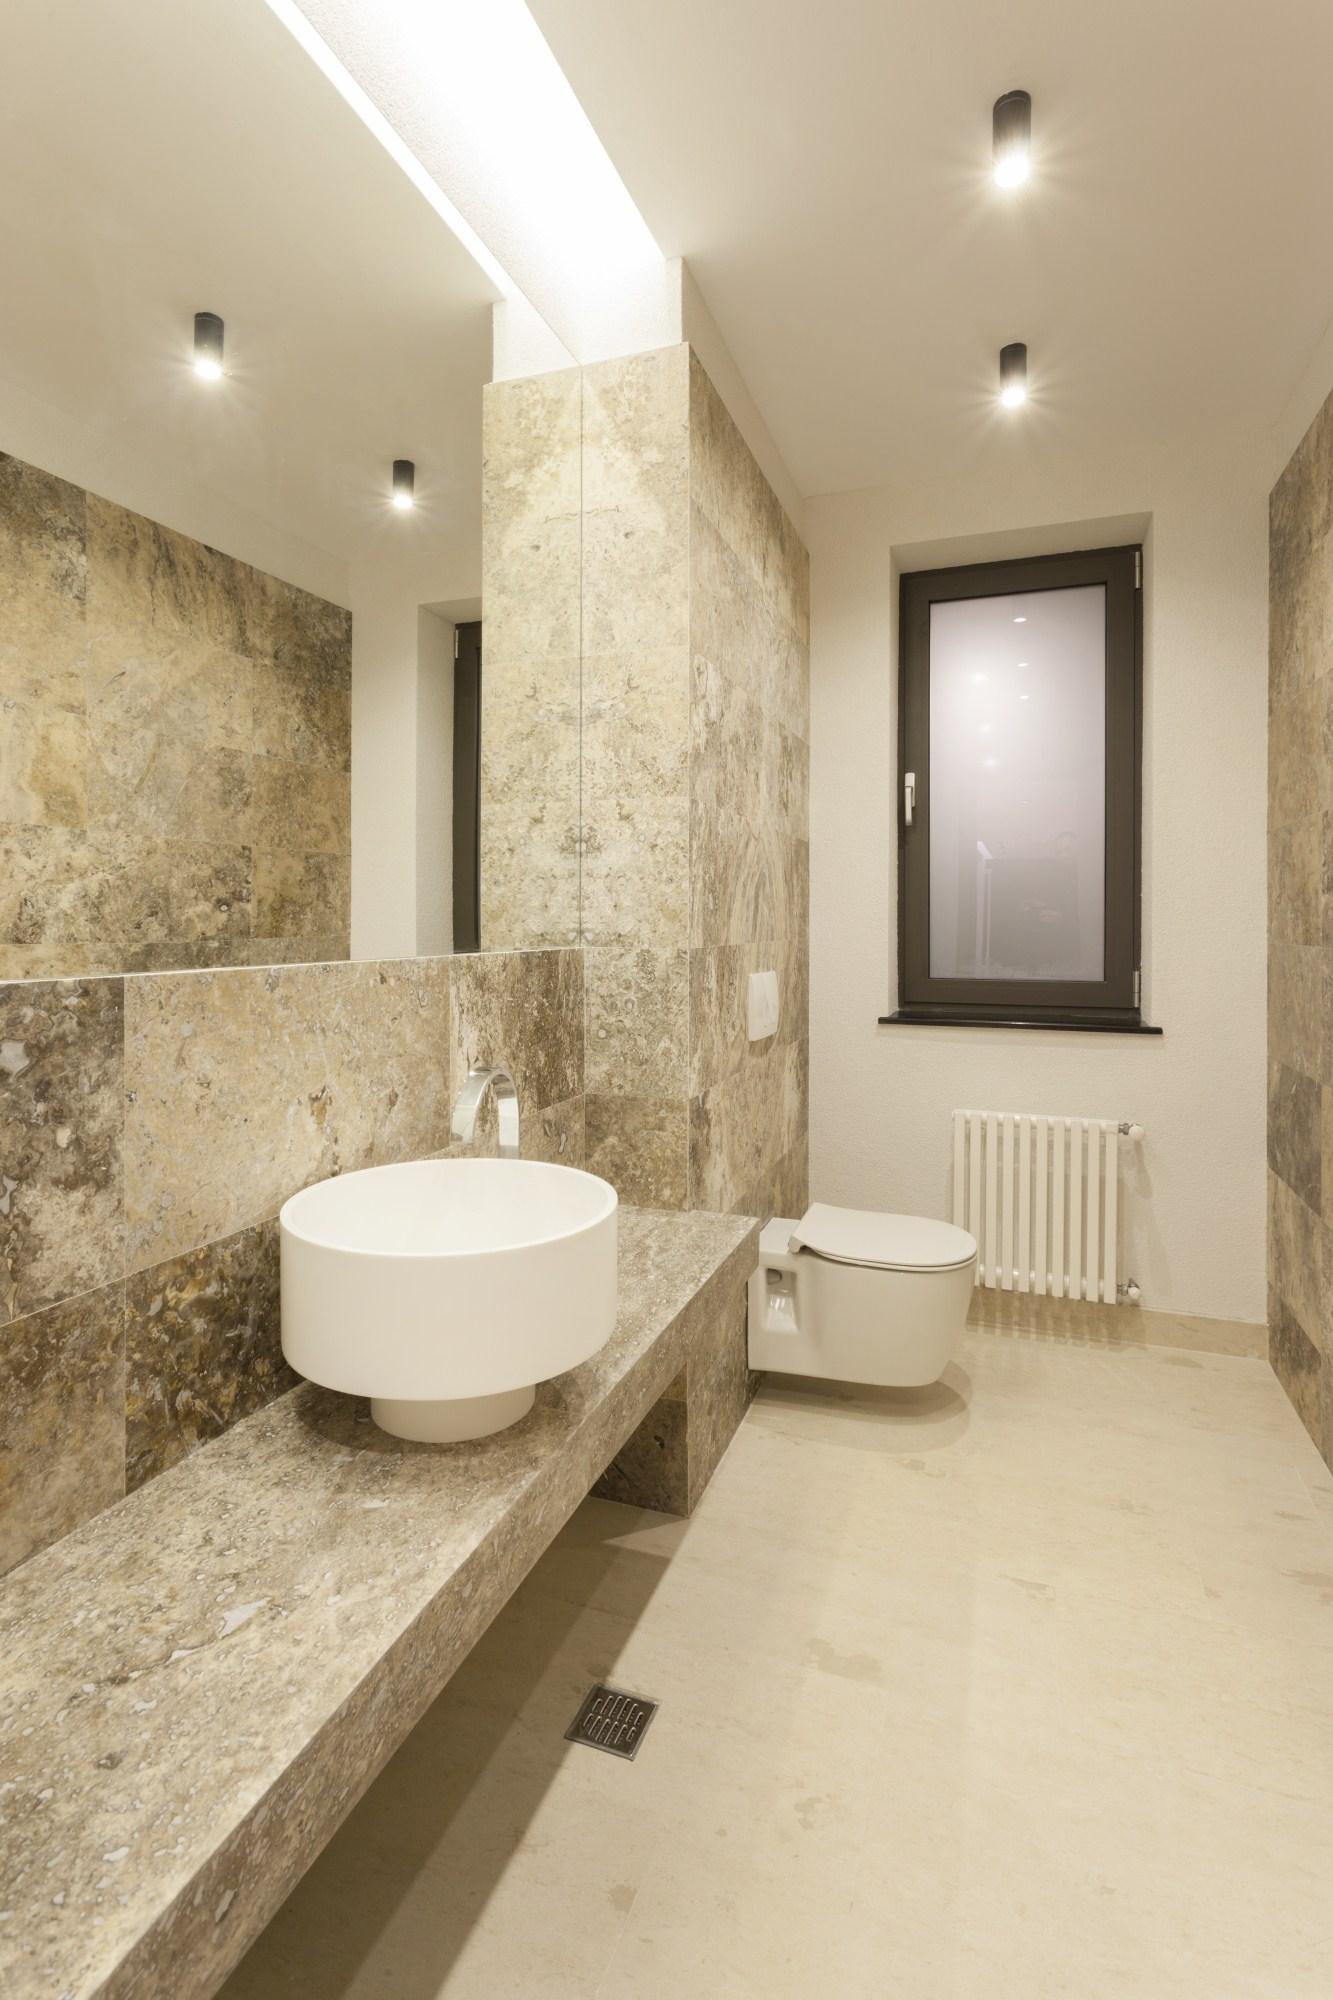 https://nbc-arhitect.ro/wp-content/uploads/2020/10/NBC-Arhitect-_-interiors-_-Vila-Pipera-_-Bucharest-Romania-_-interior-design-view_27.jpg